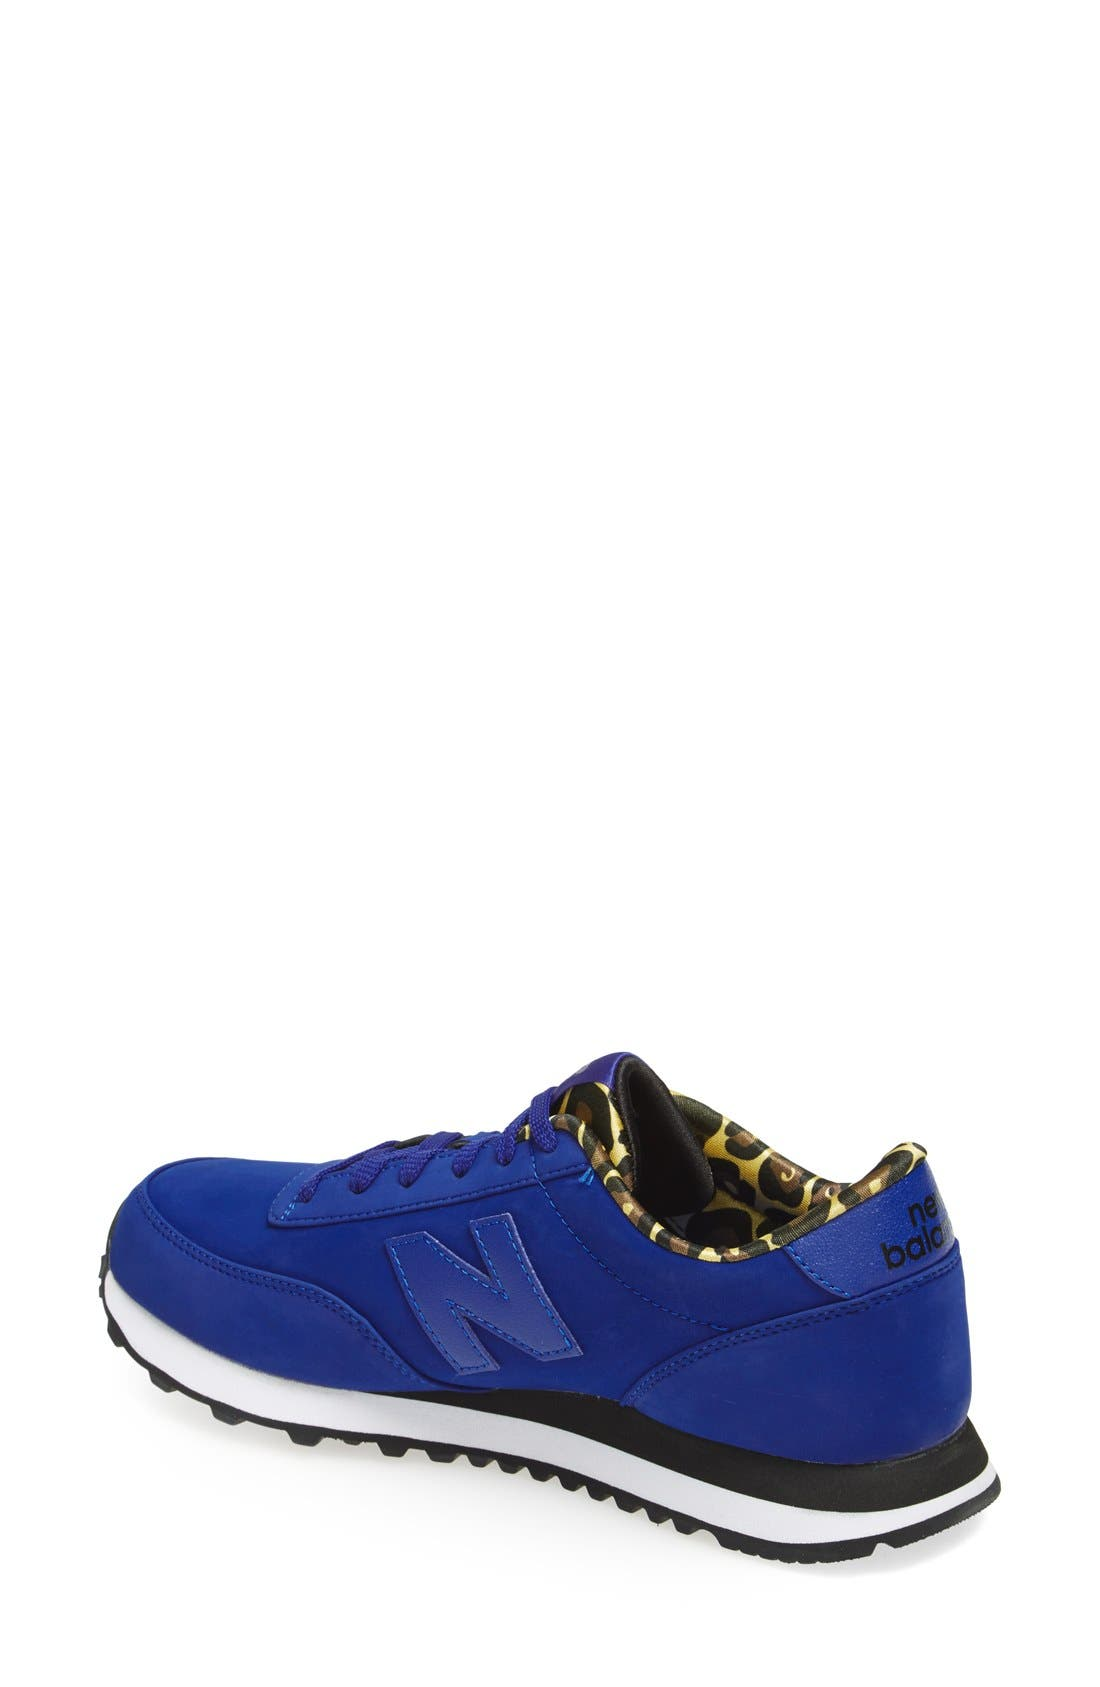 Alternate Image 2  - New Balance '501' Sneaker (Women)